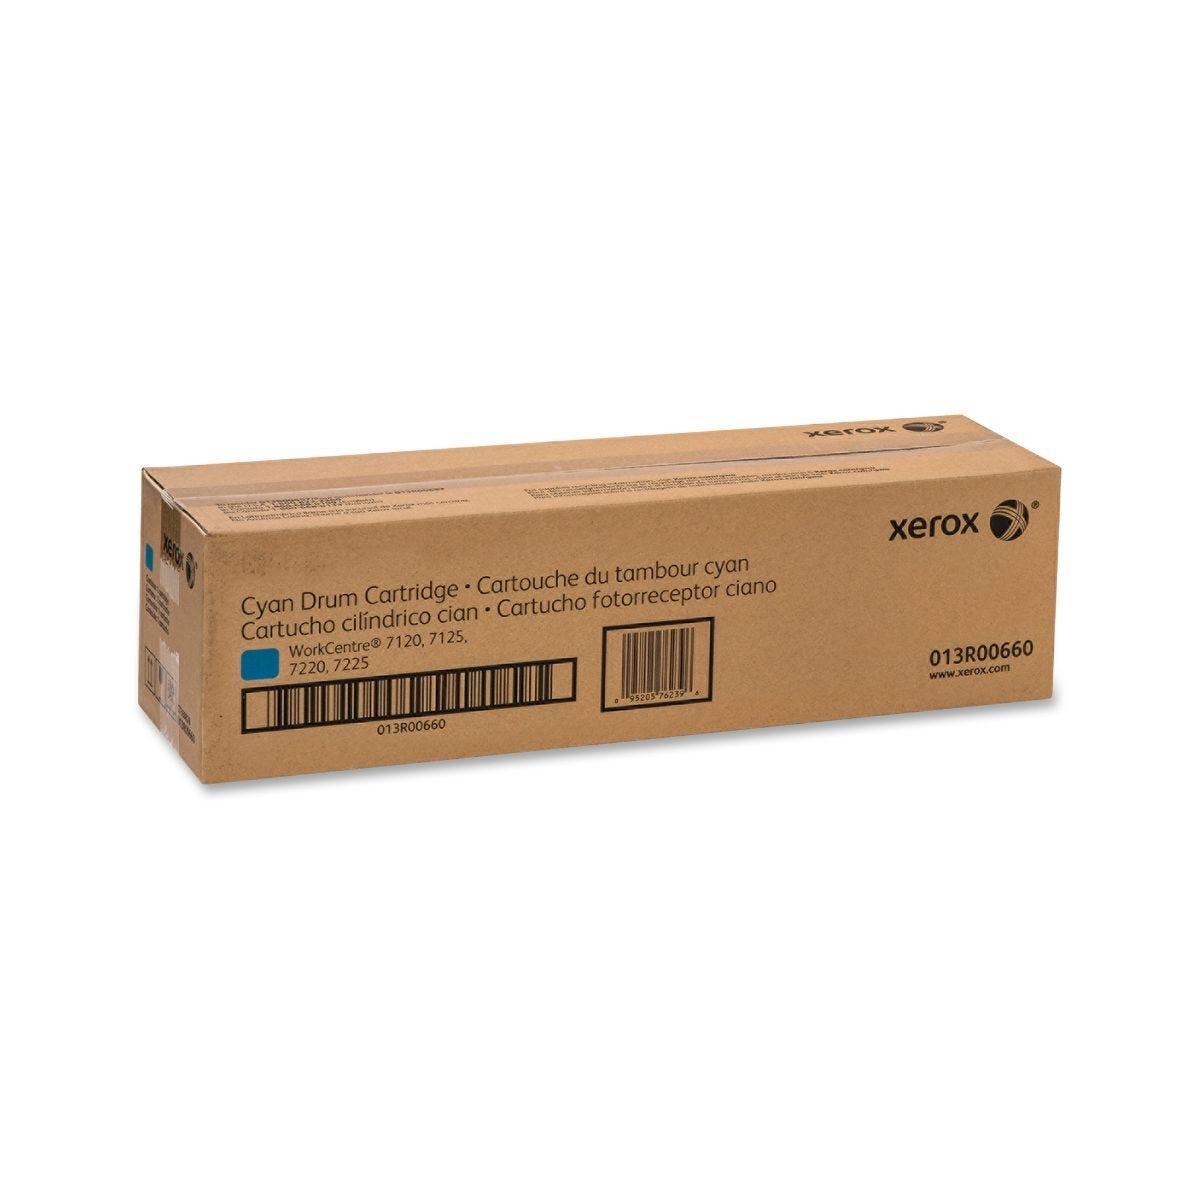 Xerox WC7120 Cyan Drum